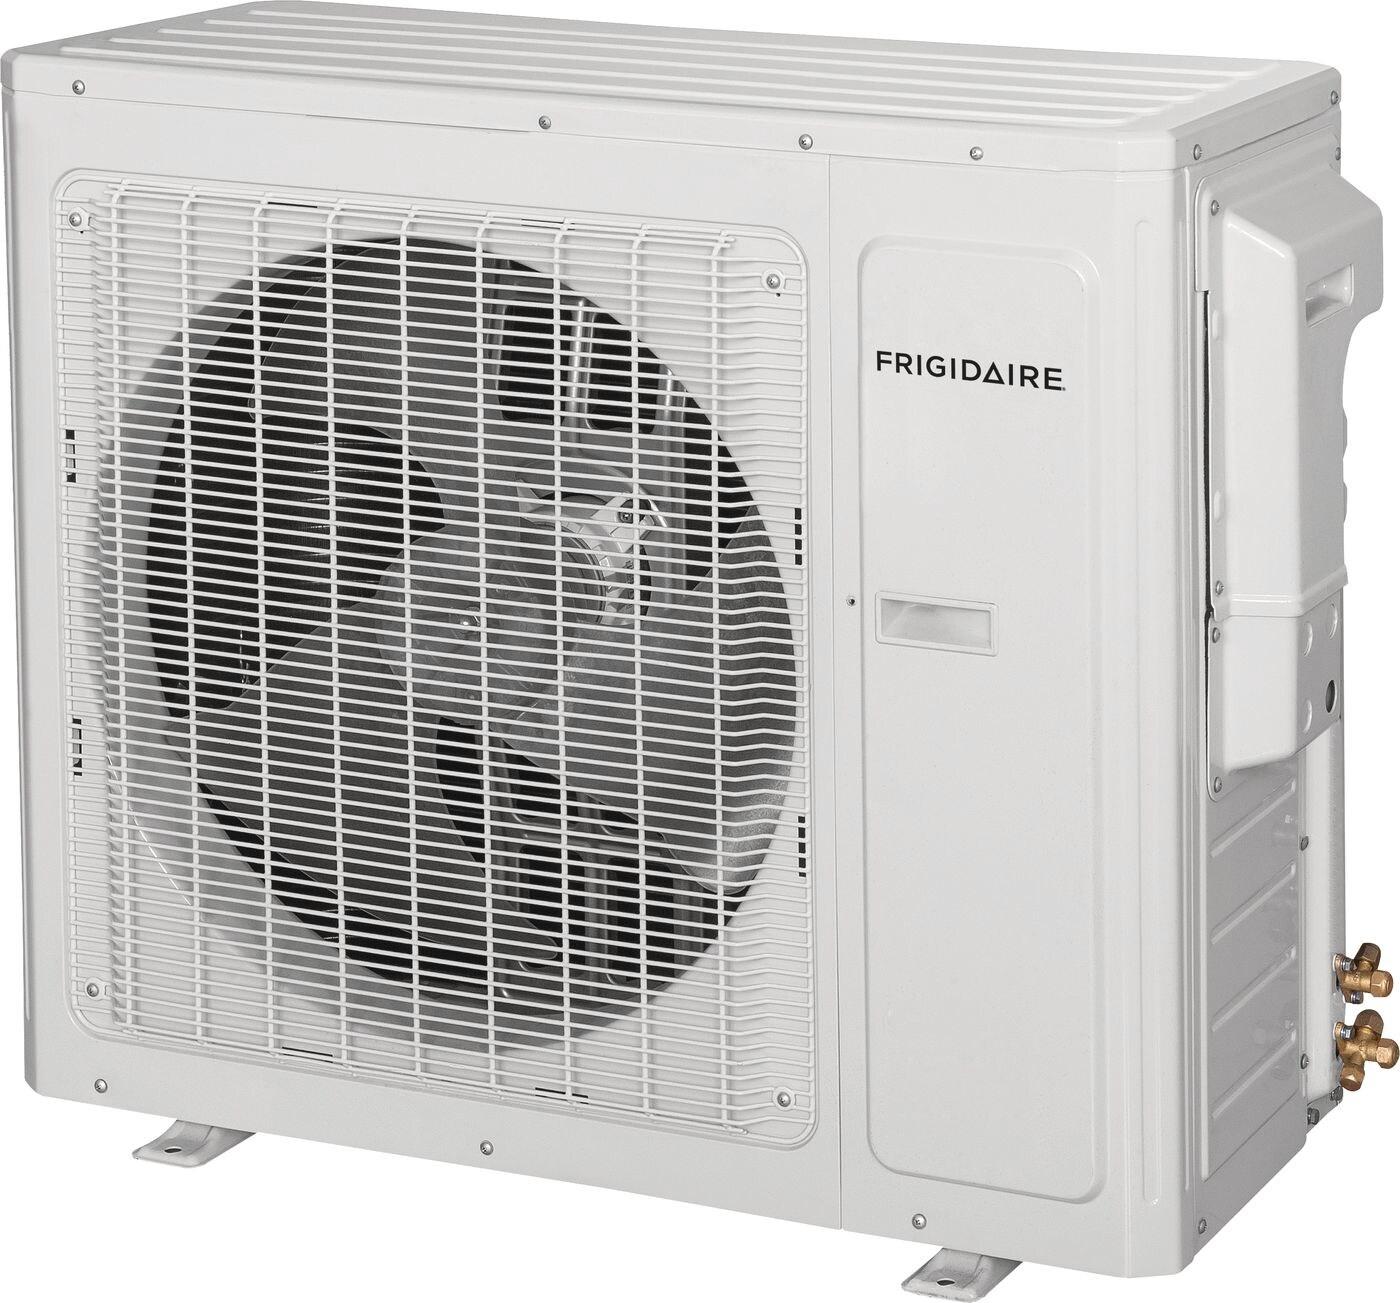 Model: FFHP362CQ2   Frigidaire Ductless Split Air Conditioner with Heat Pump, 33,600 BTU